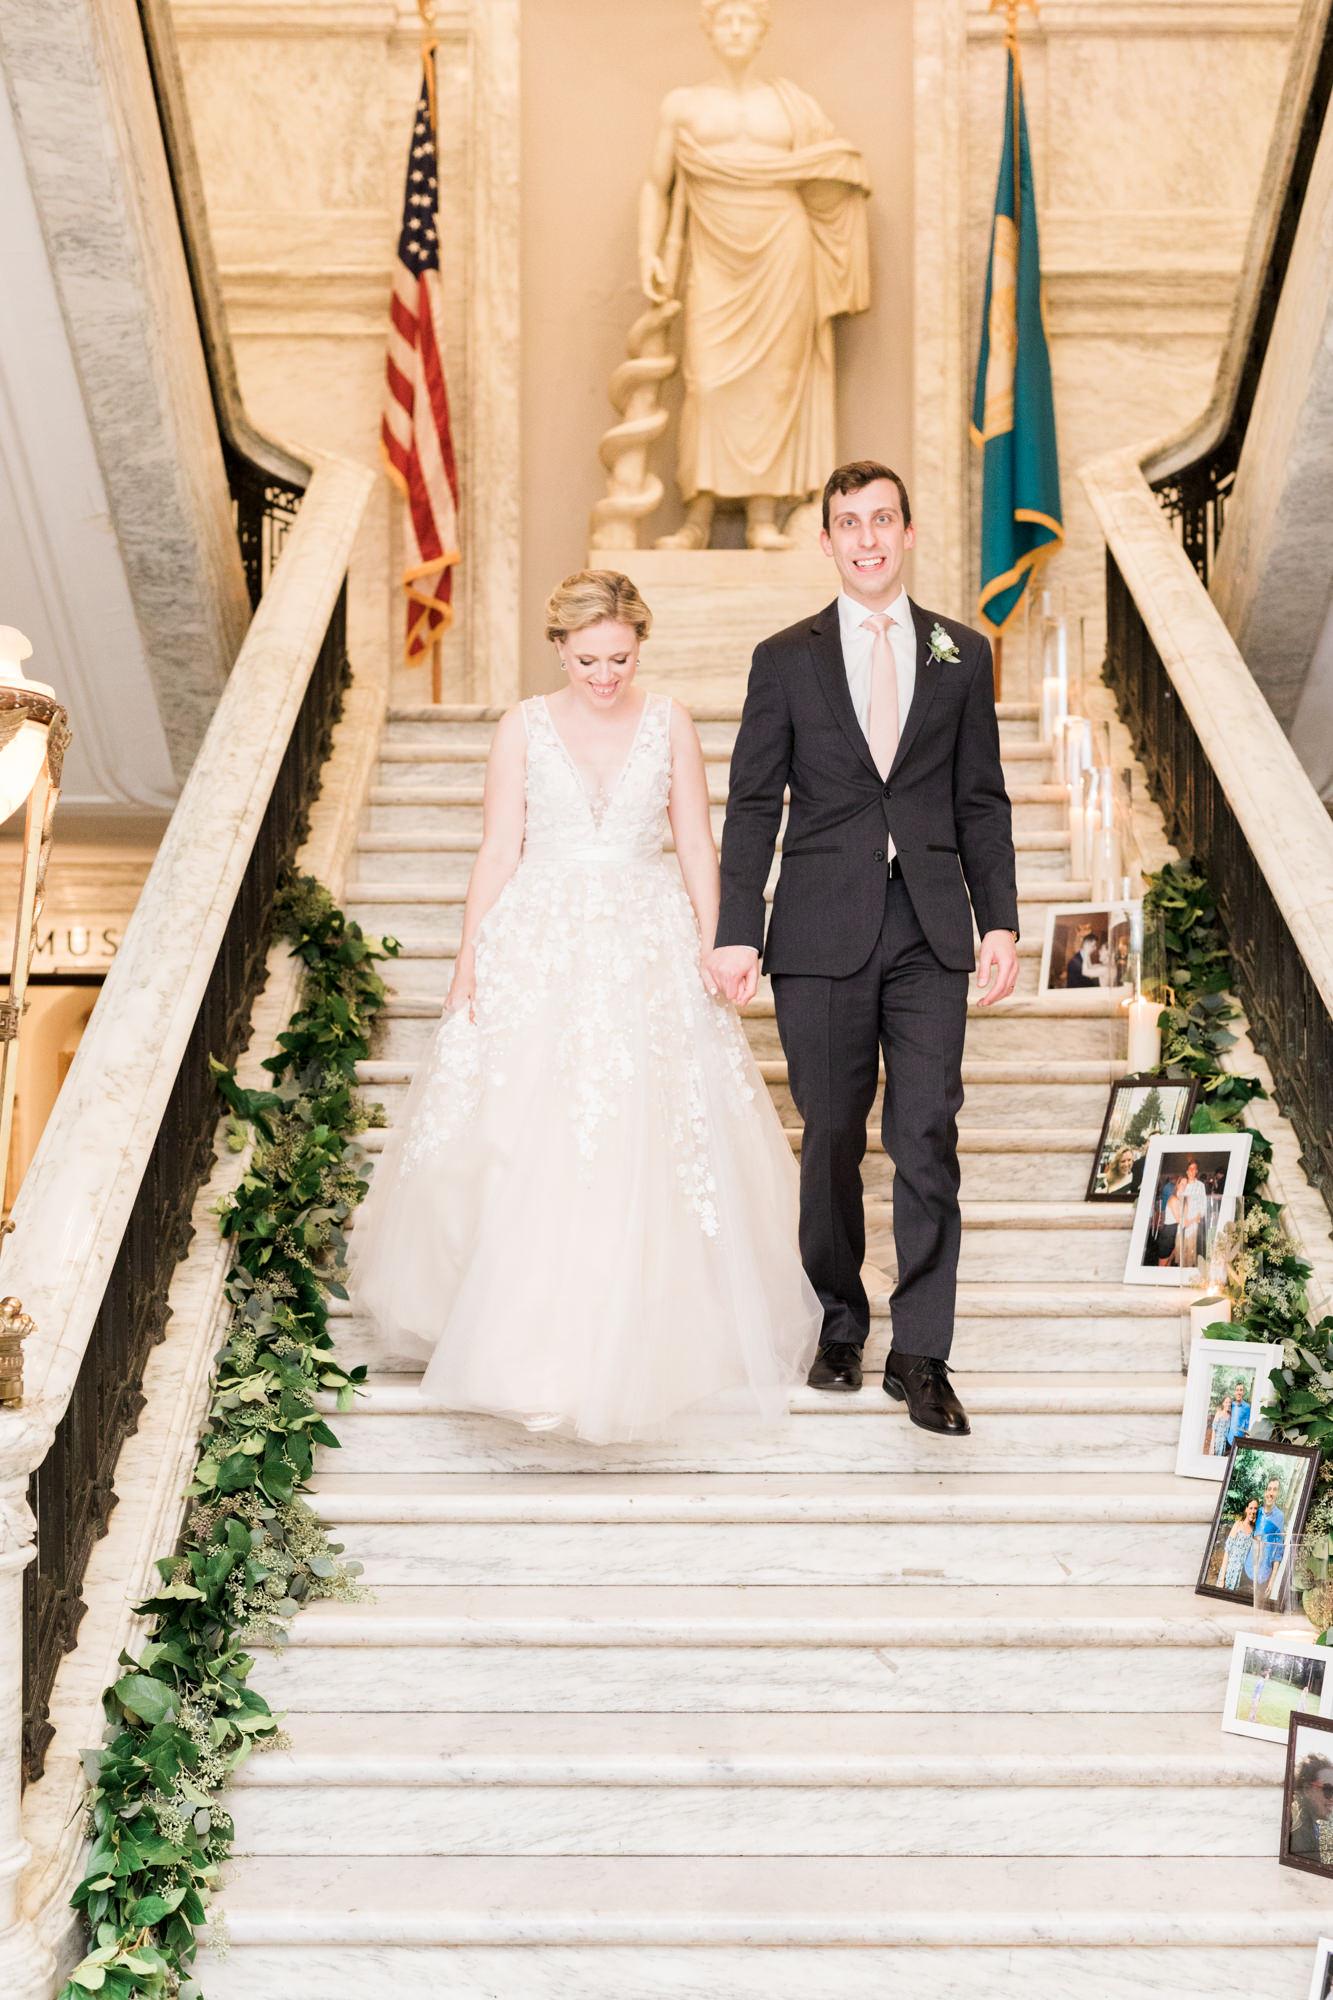 haley-richter-photography-autumn-college-of-physicians-wedding-philadelphia--286.jpg